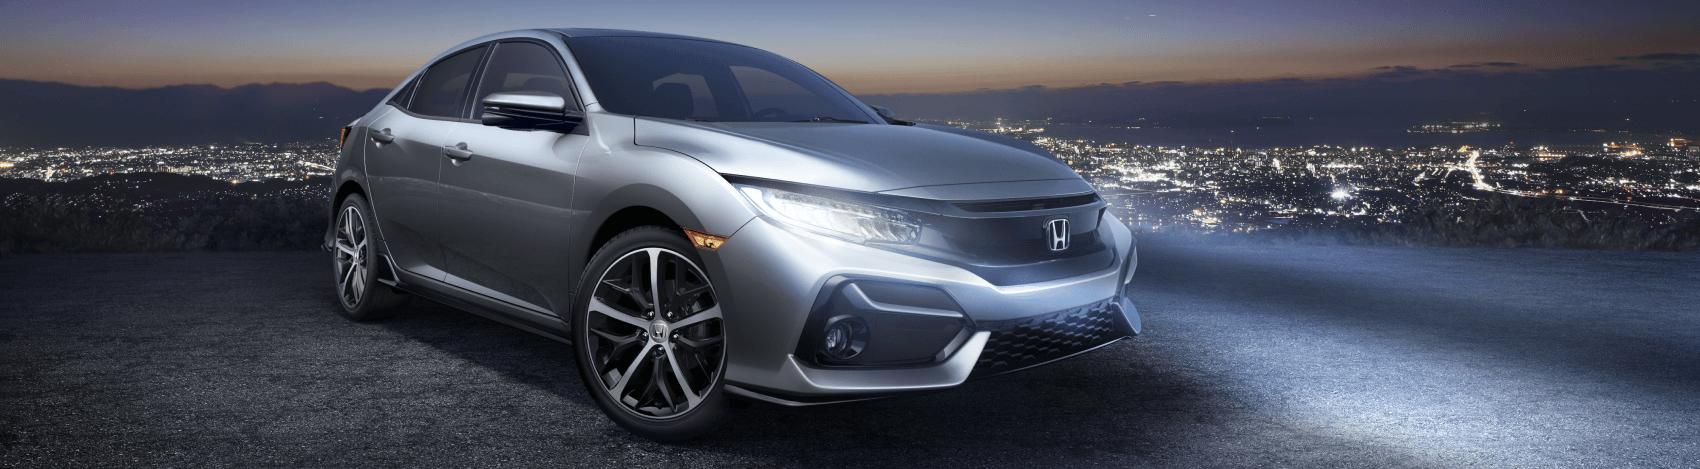 2021 Honda Civic Silver